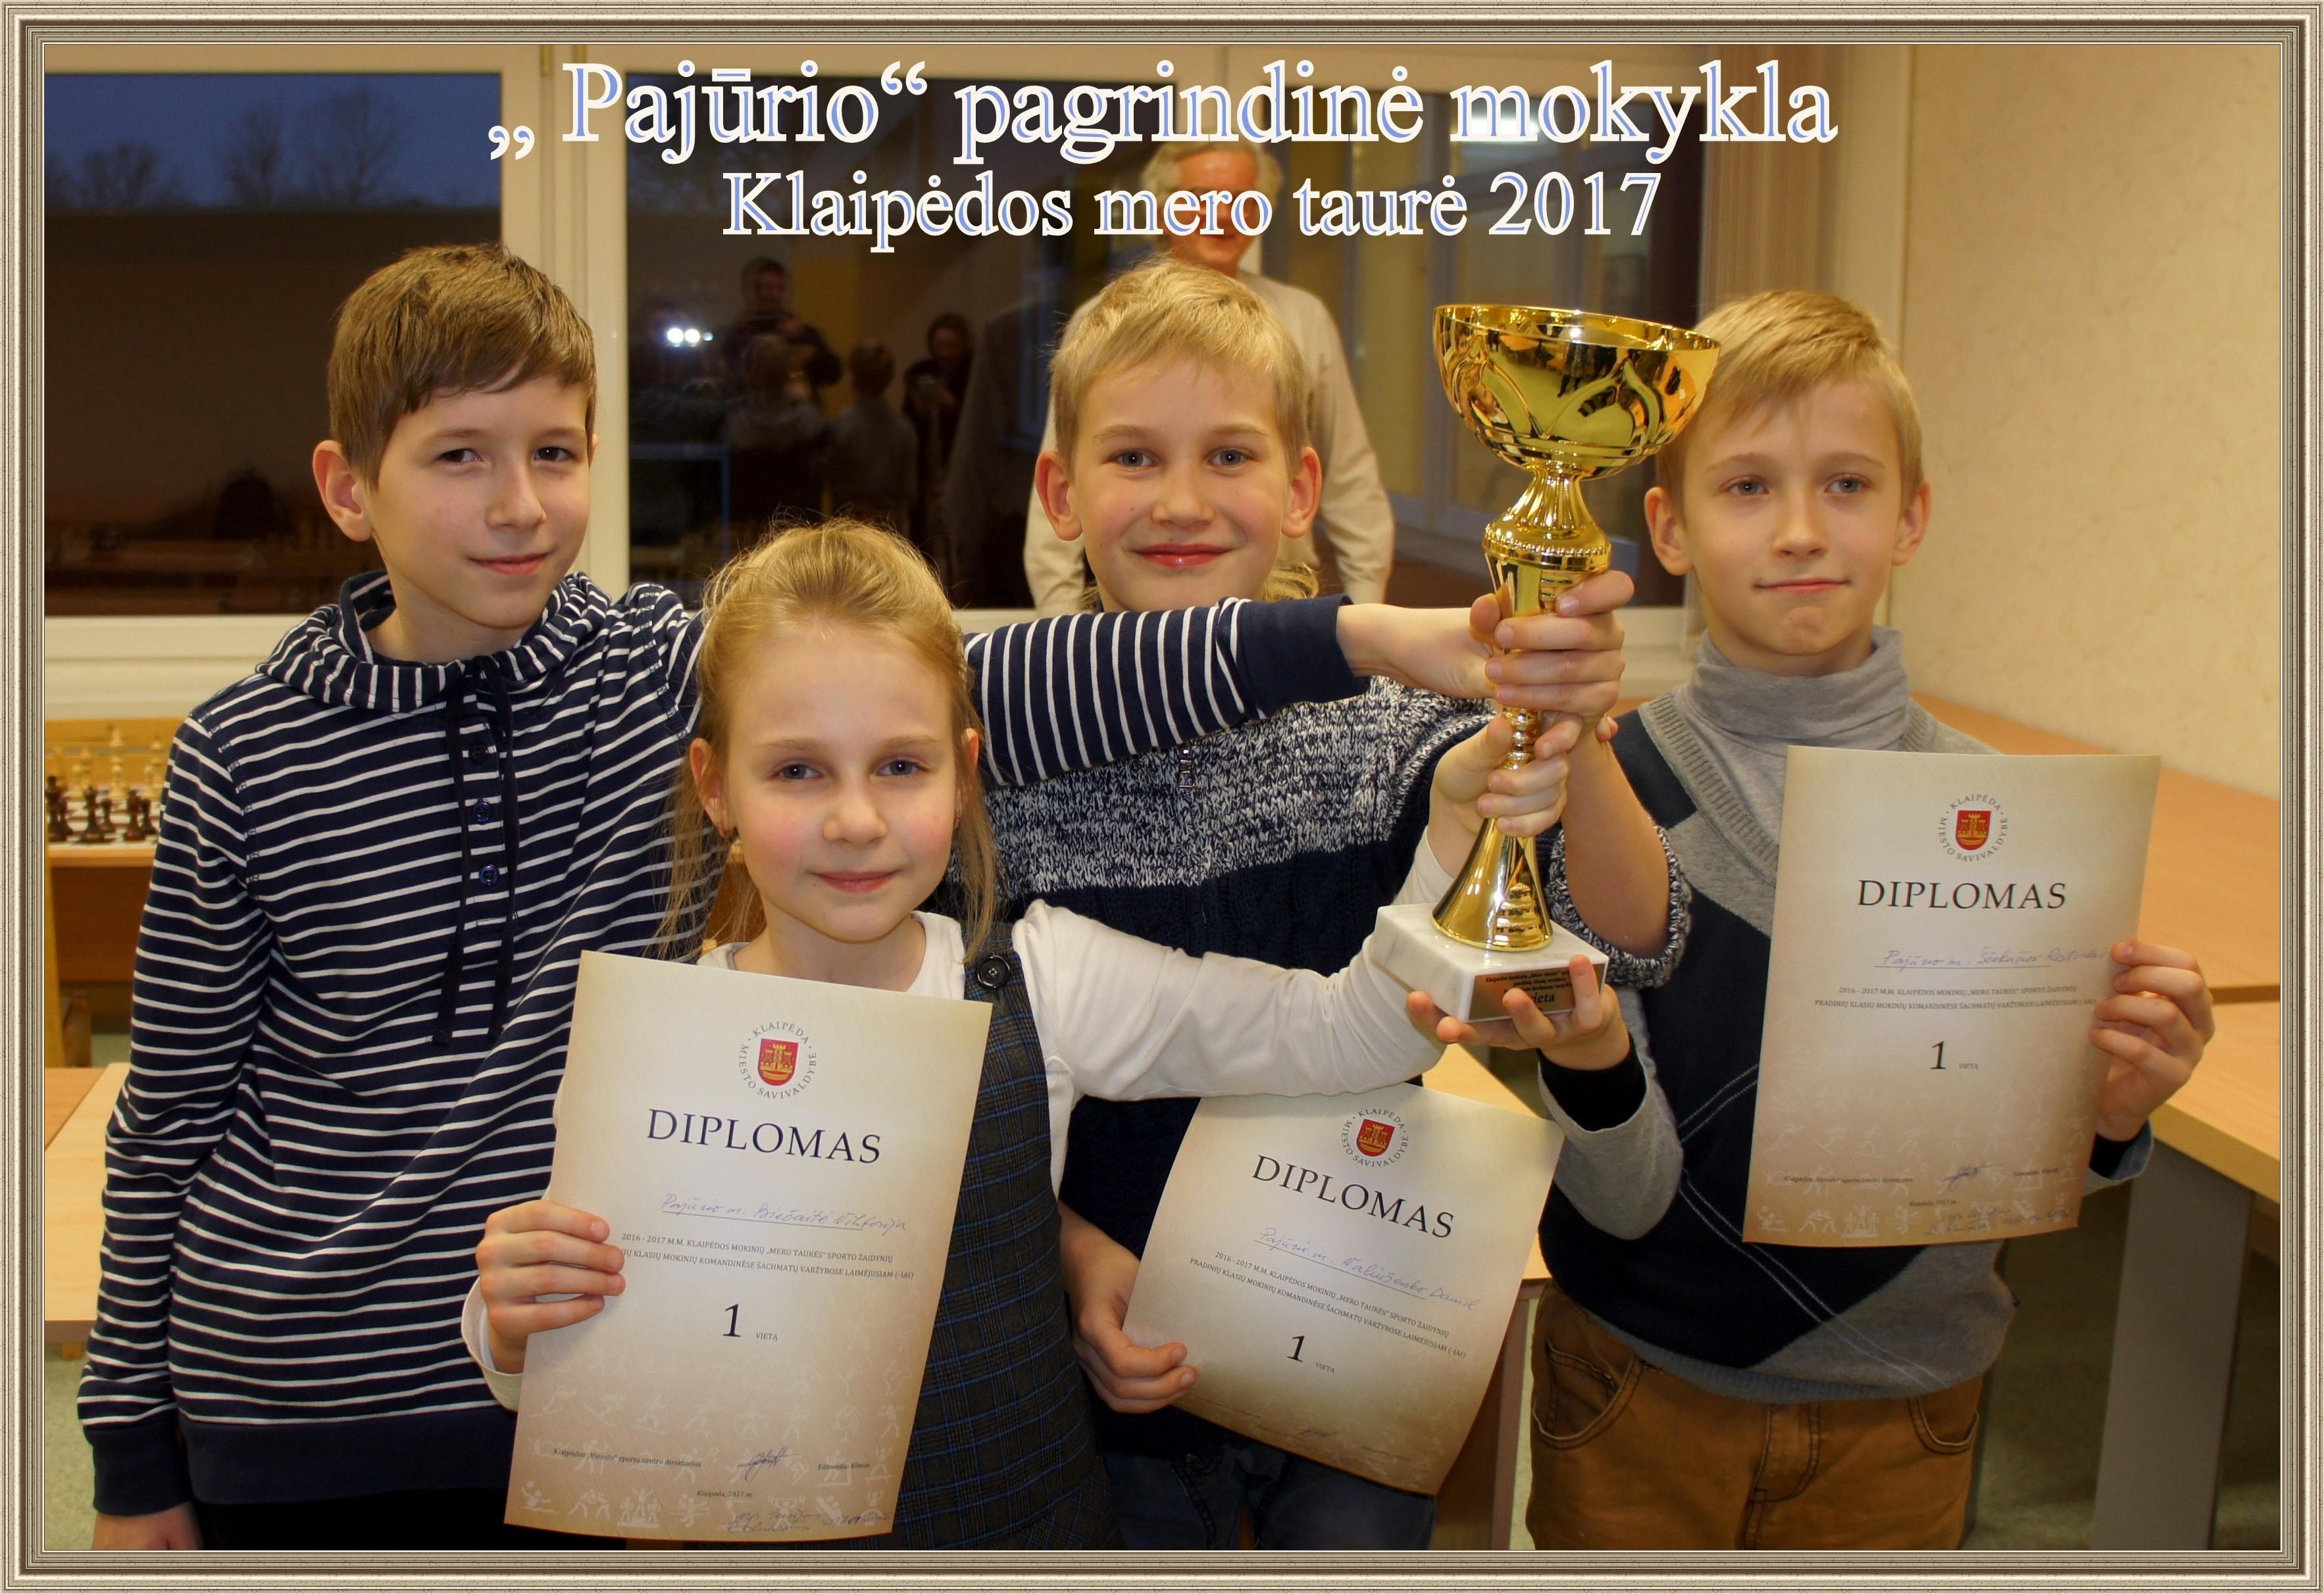 Klaipėdos mero taurė 2017 1